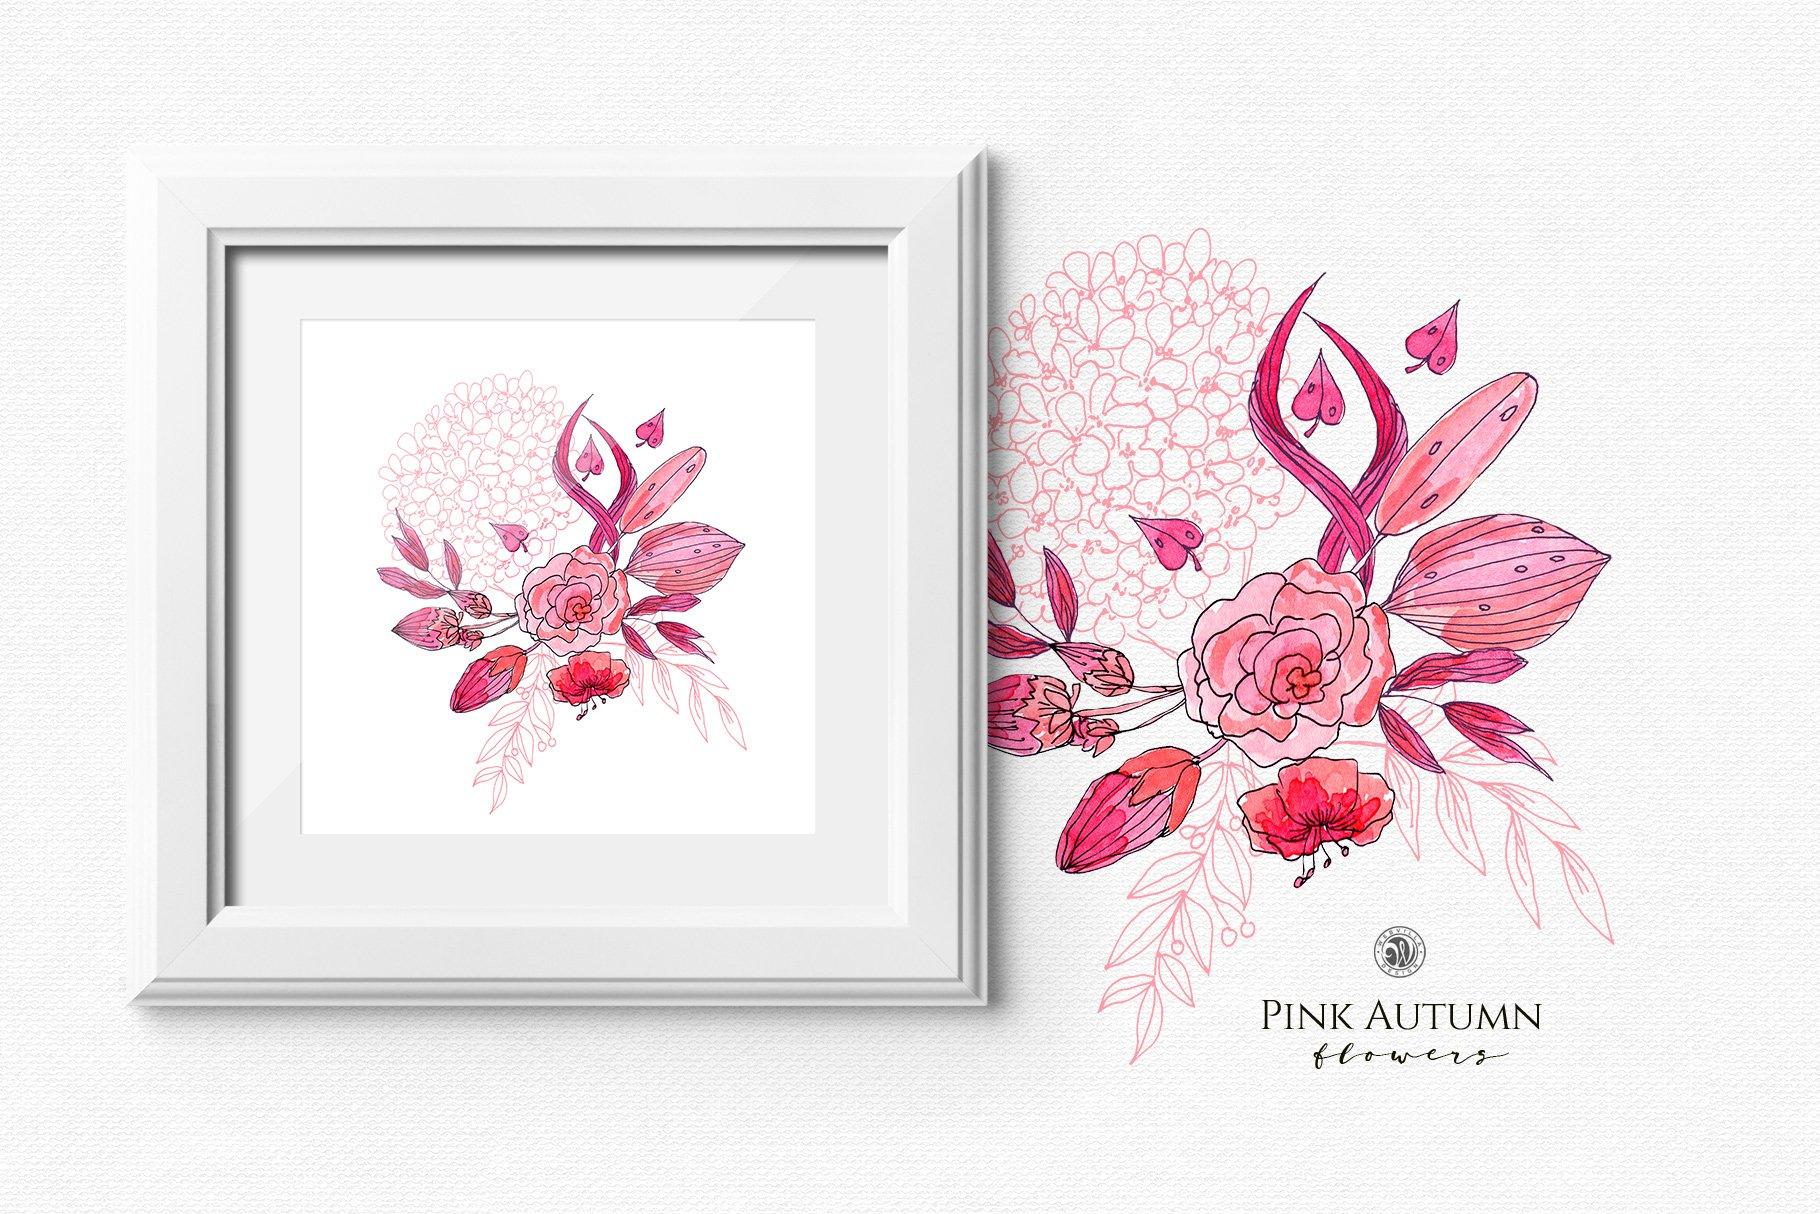 Pink Autumn Flowers Illustrations Creative Market Pro